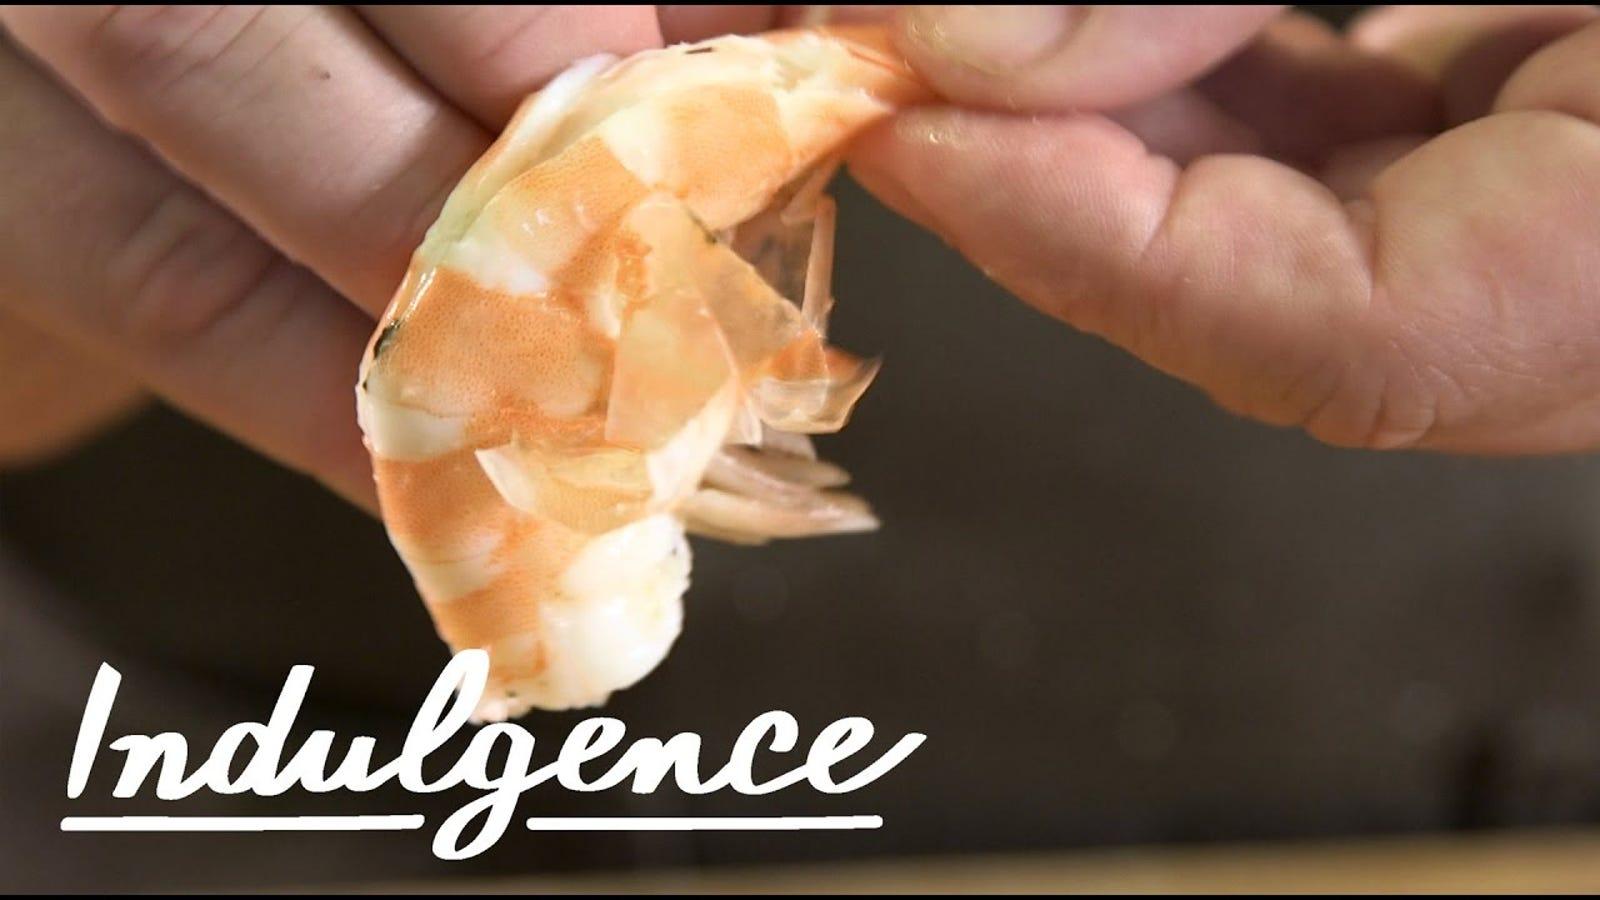 Devein and Peel Shrimp Like a Pro